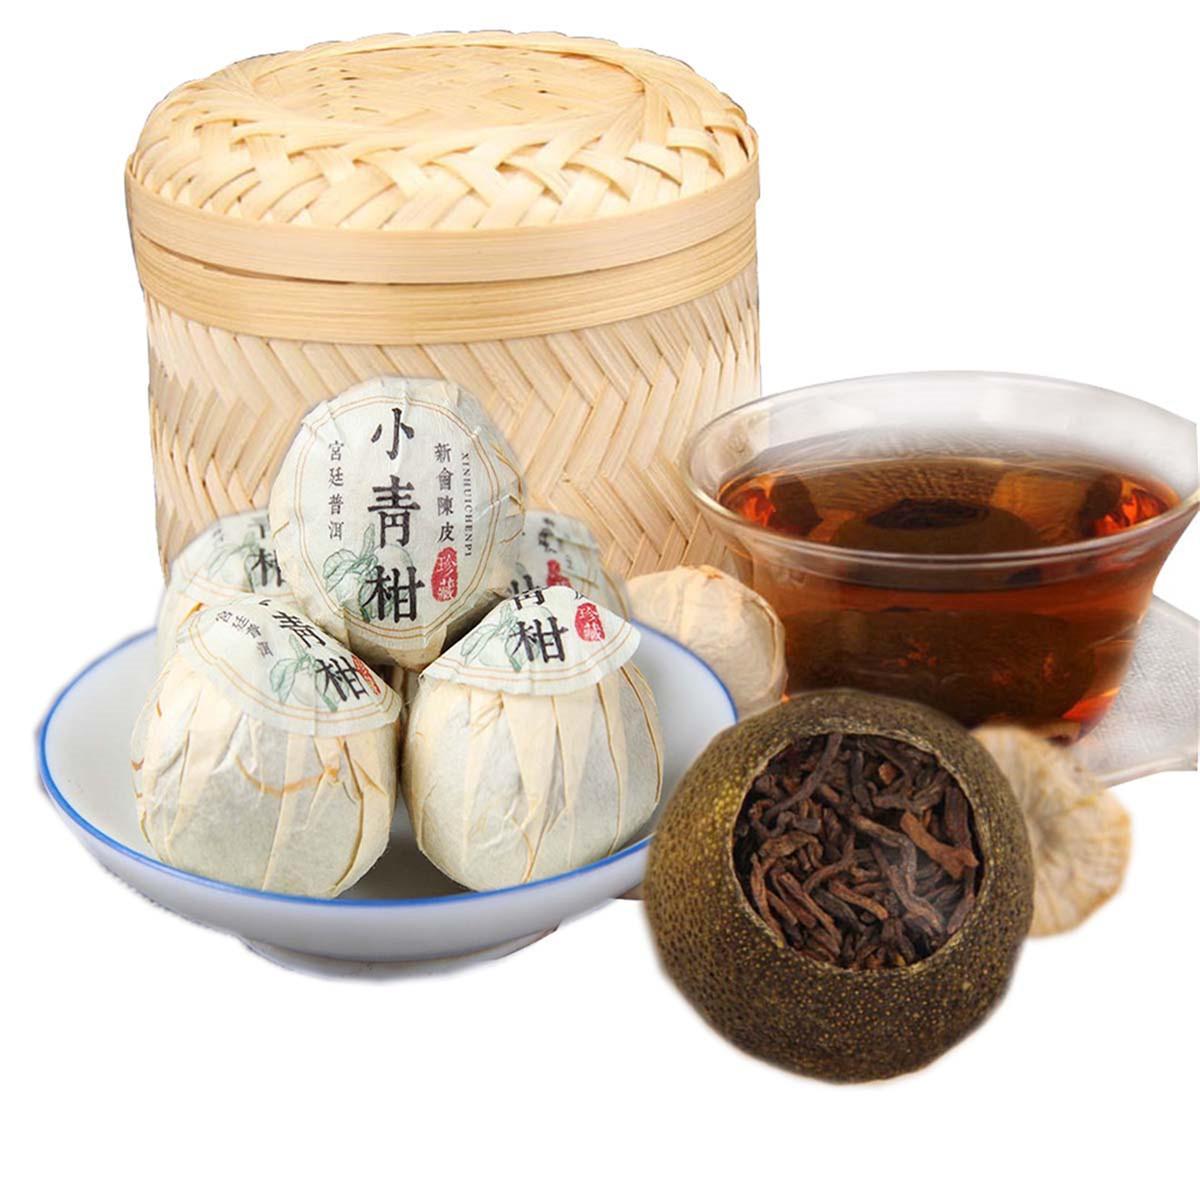 250g madura Pu Er té de Yunnan Pequeña mandarina verde de la PU er Pu'er té orgánico rojo Puer El más antiguo árbol natural Pu erh Negro Puerh